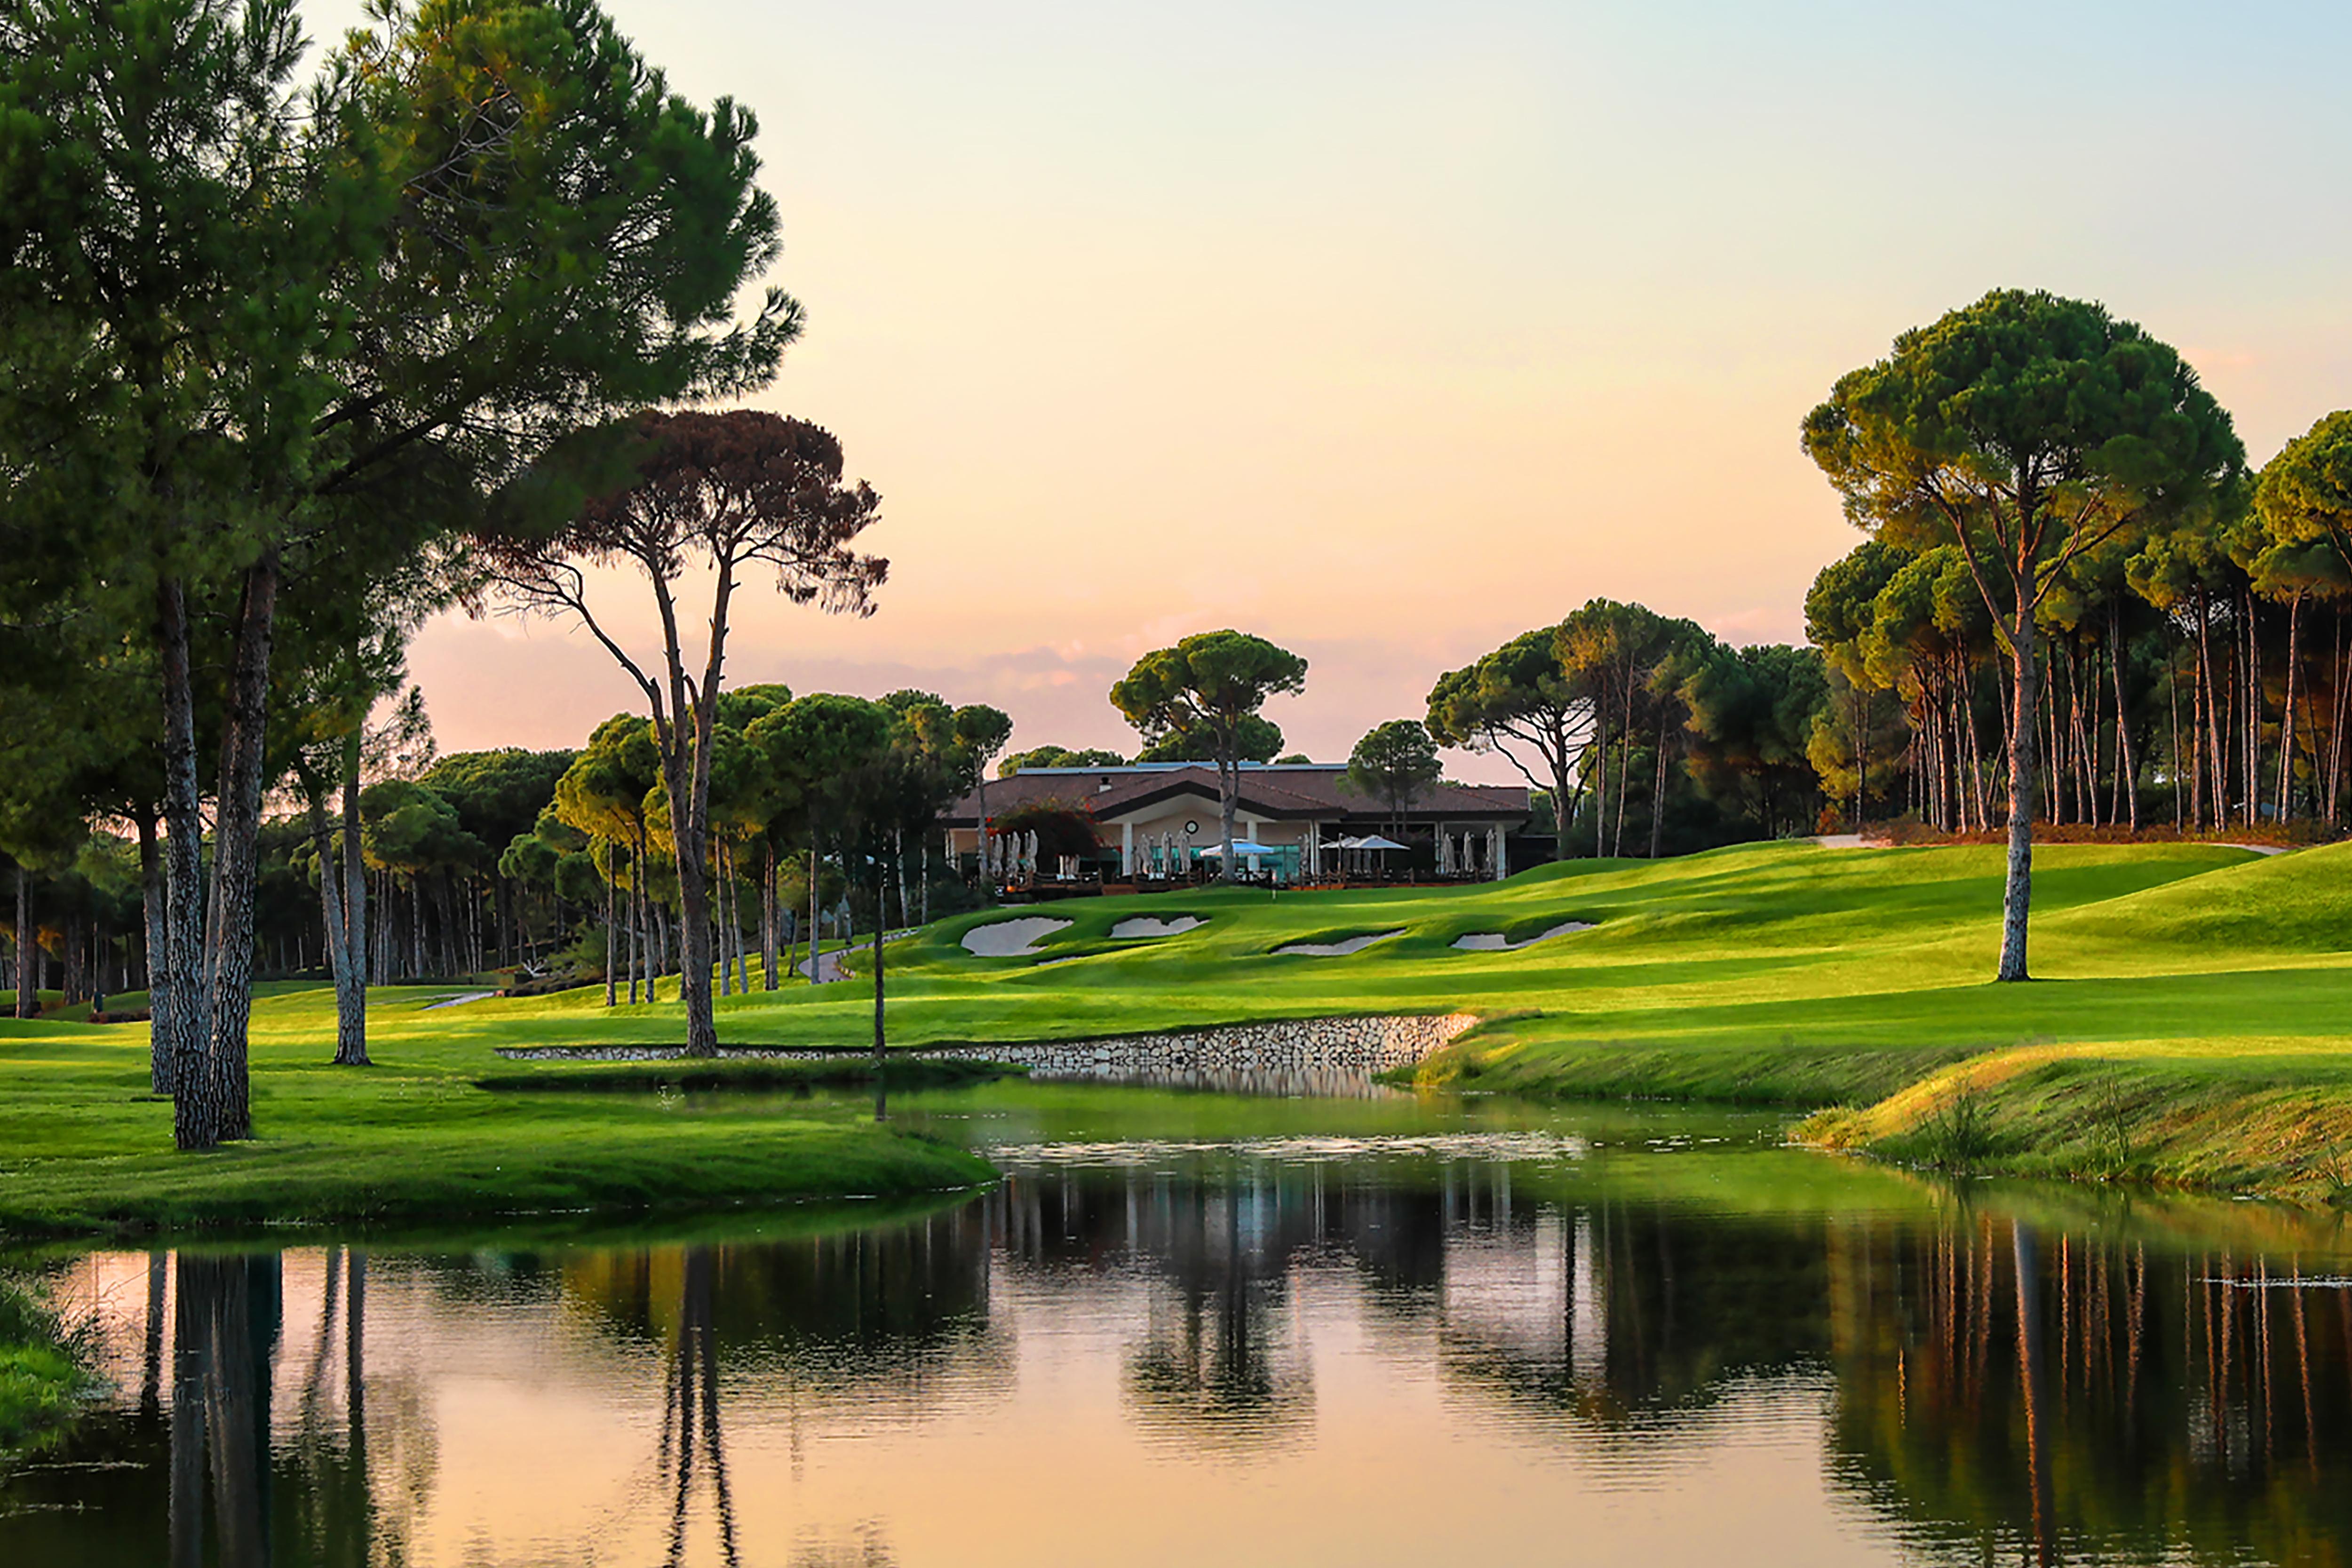 carya-golf-club-019-regnum-carya